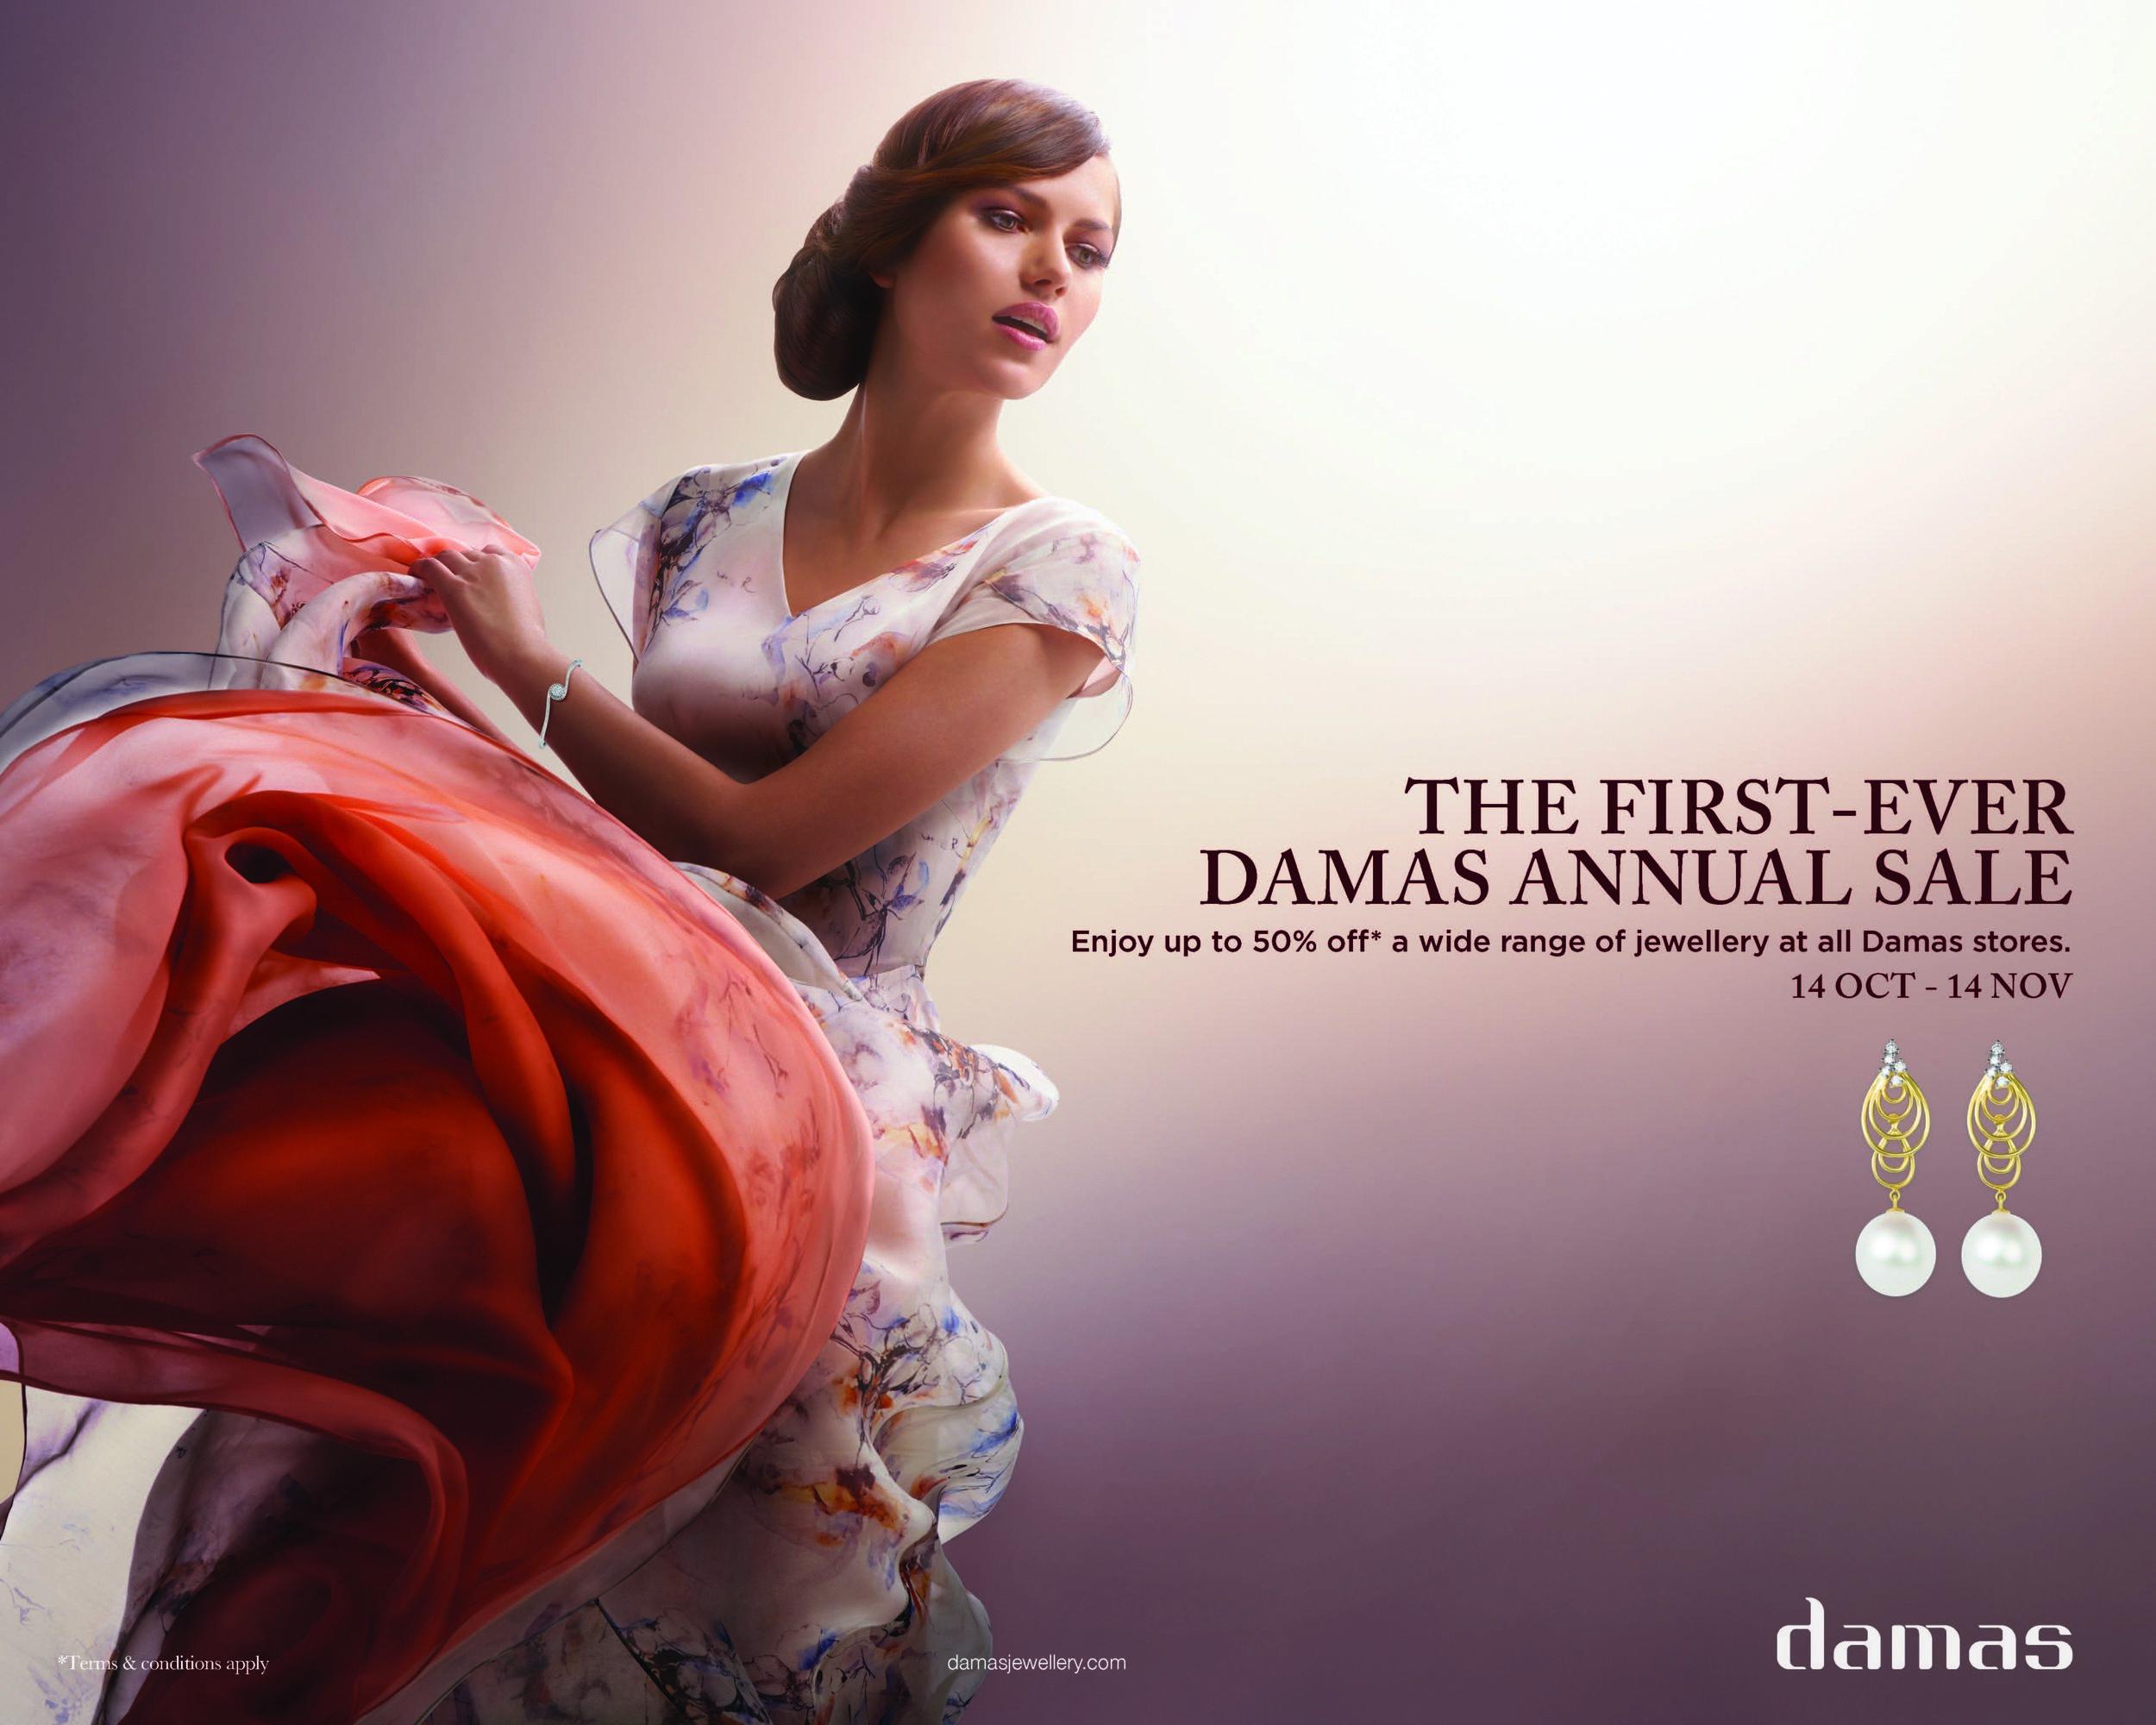 Damas Sale   Agency - J Walter Thompson Dubai  Photographer -  Mazen Abusrour